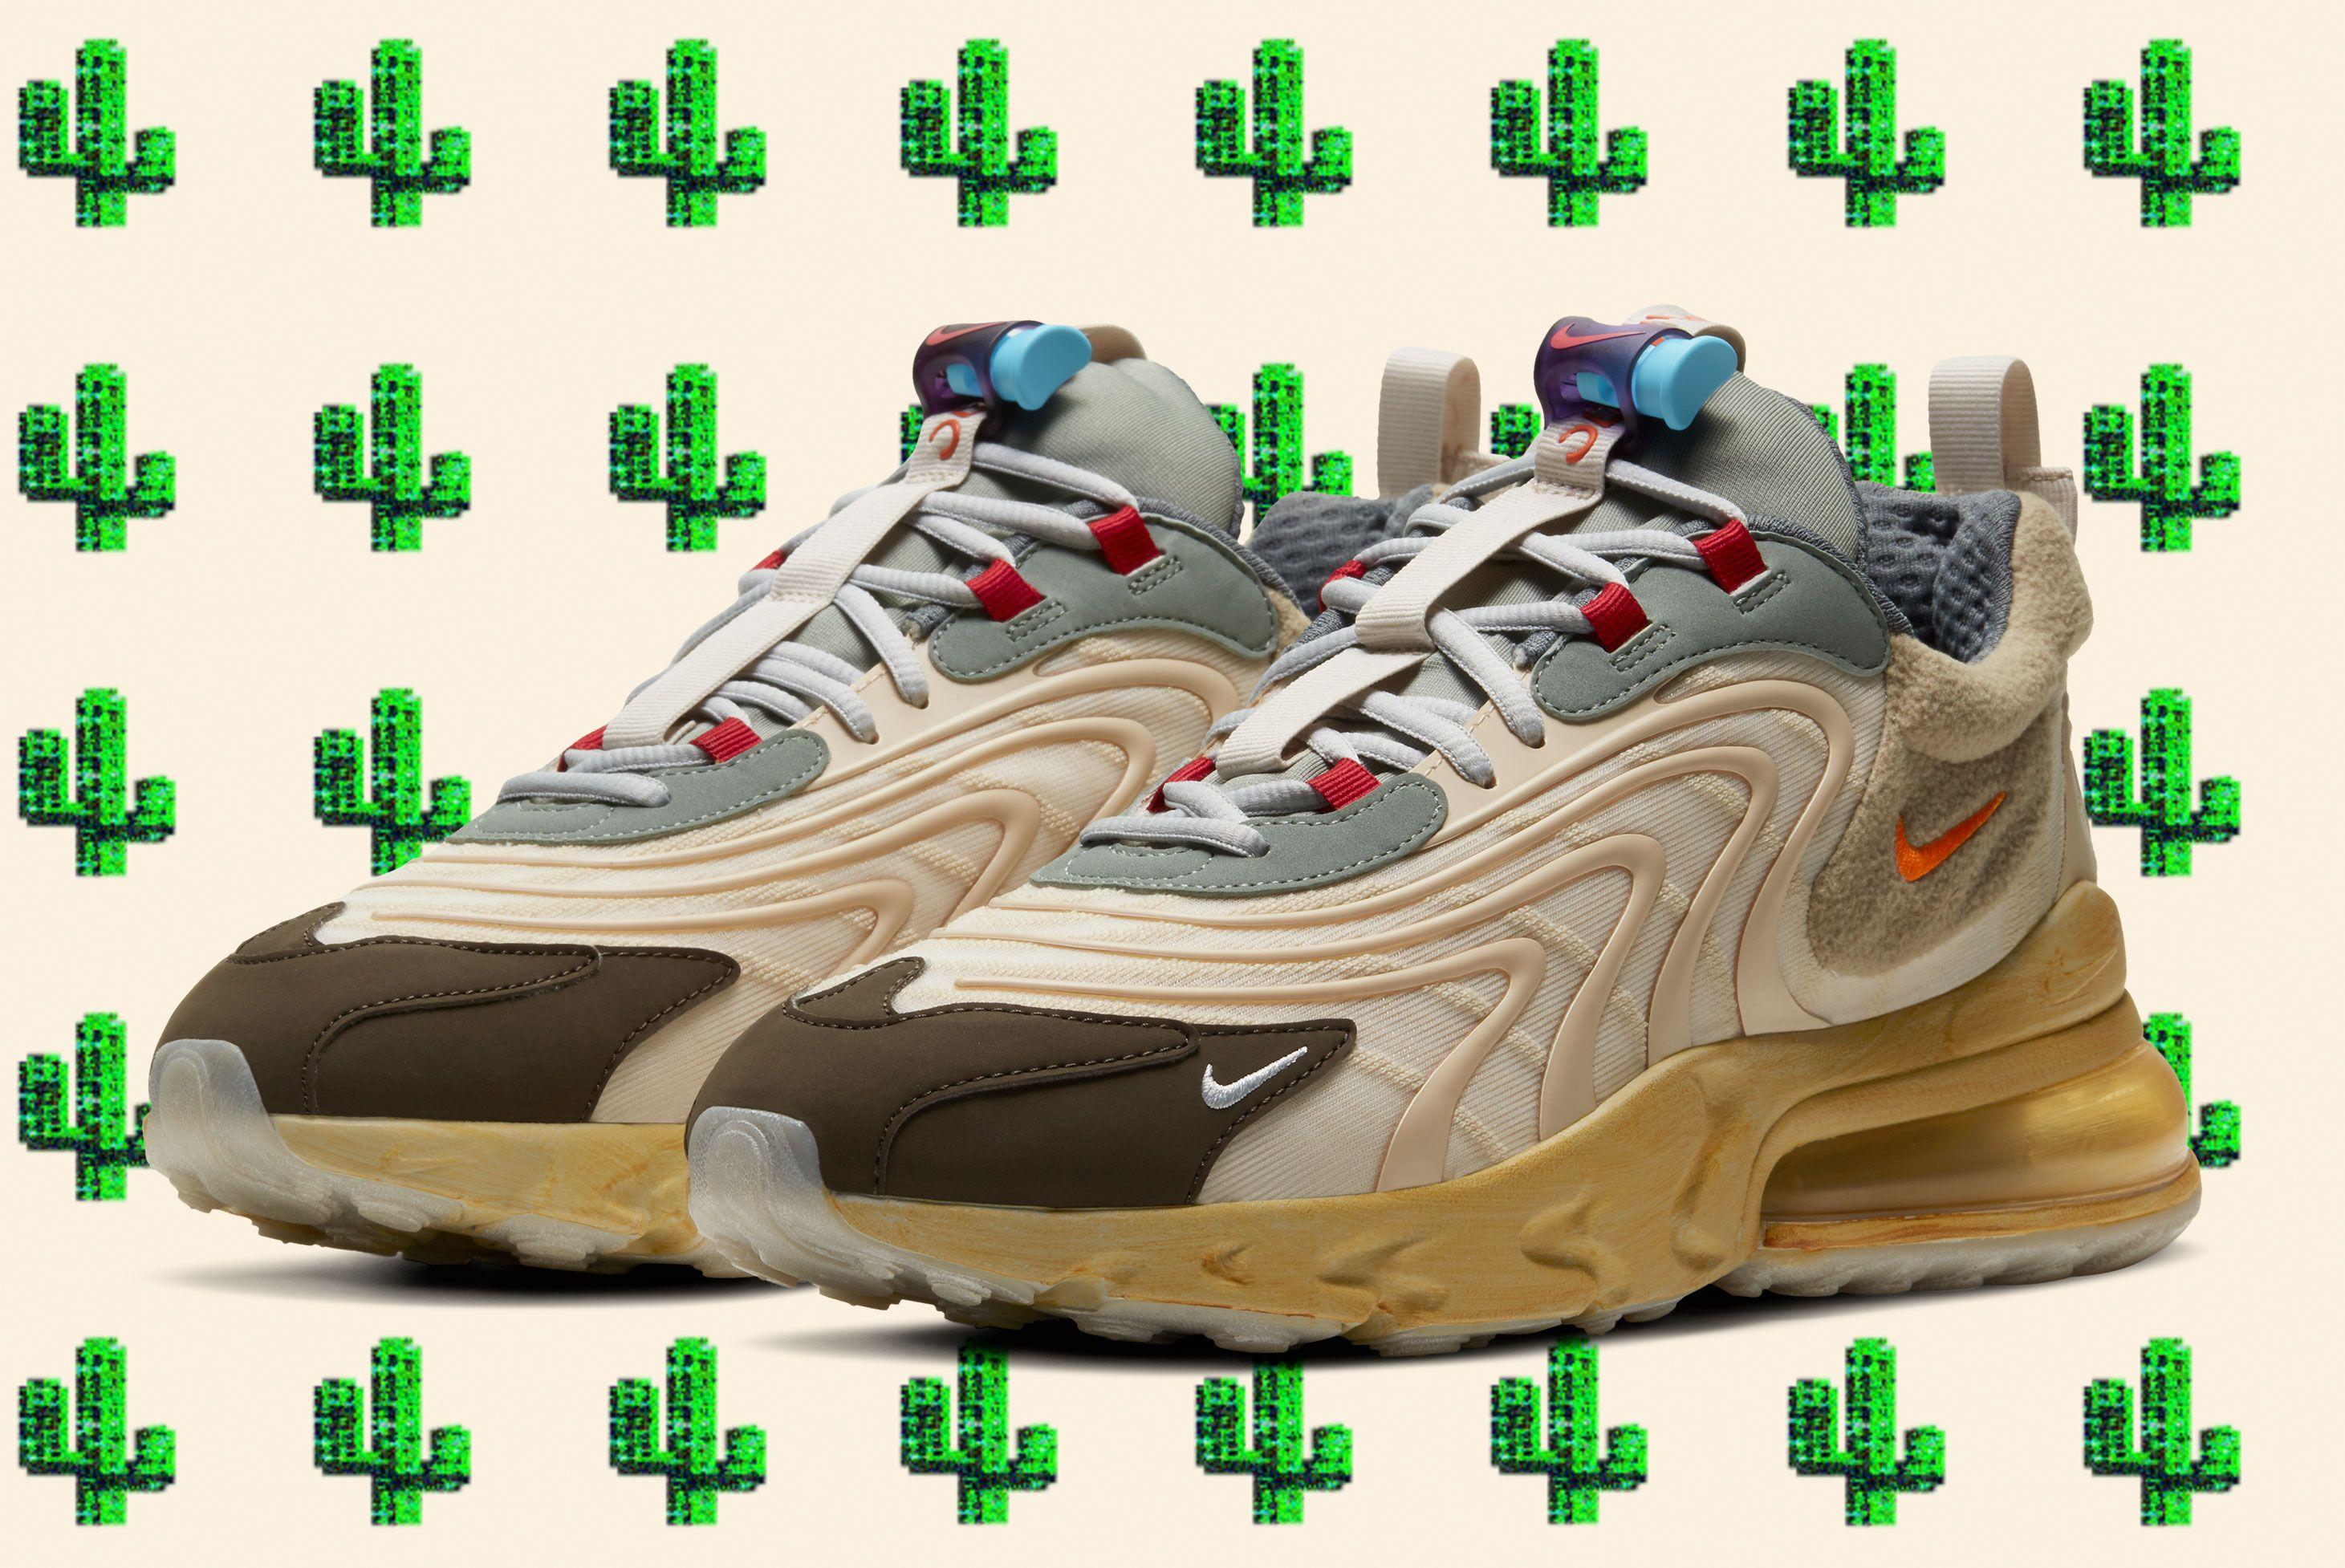 Travis Scott x Nike Air Max 270 'Cactus Trails'